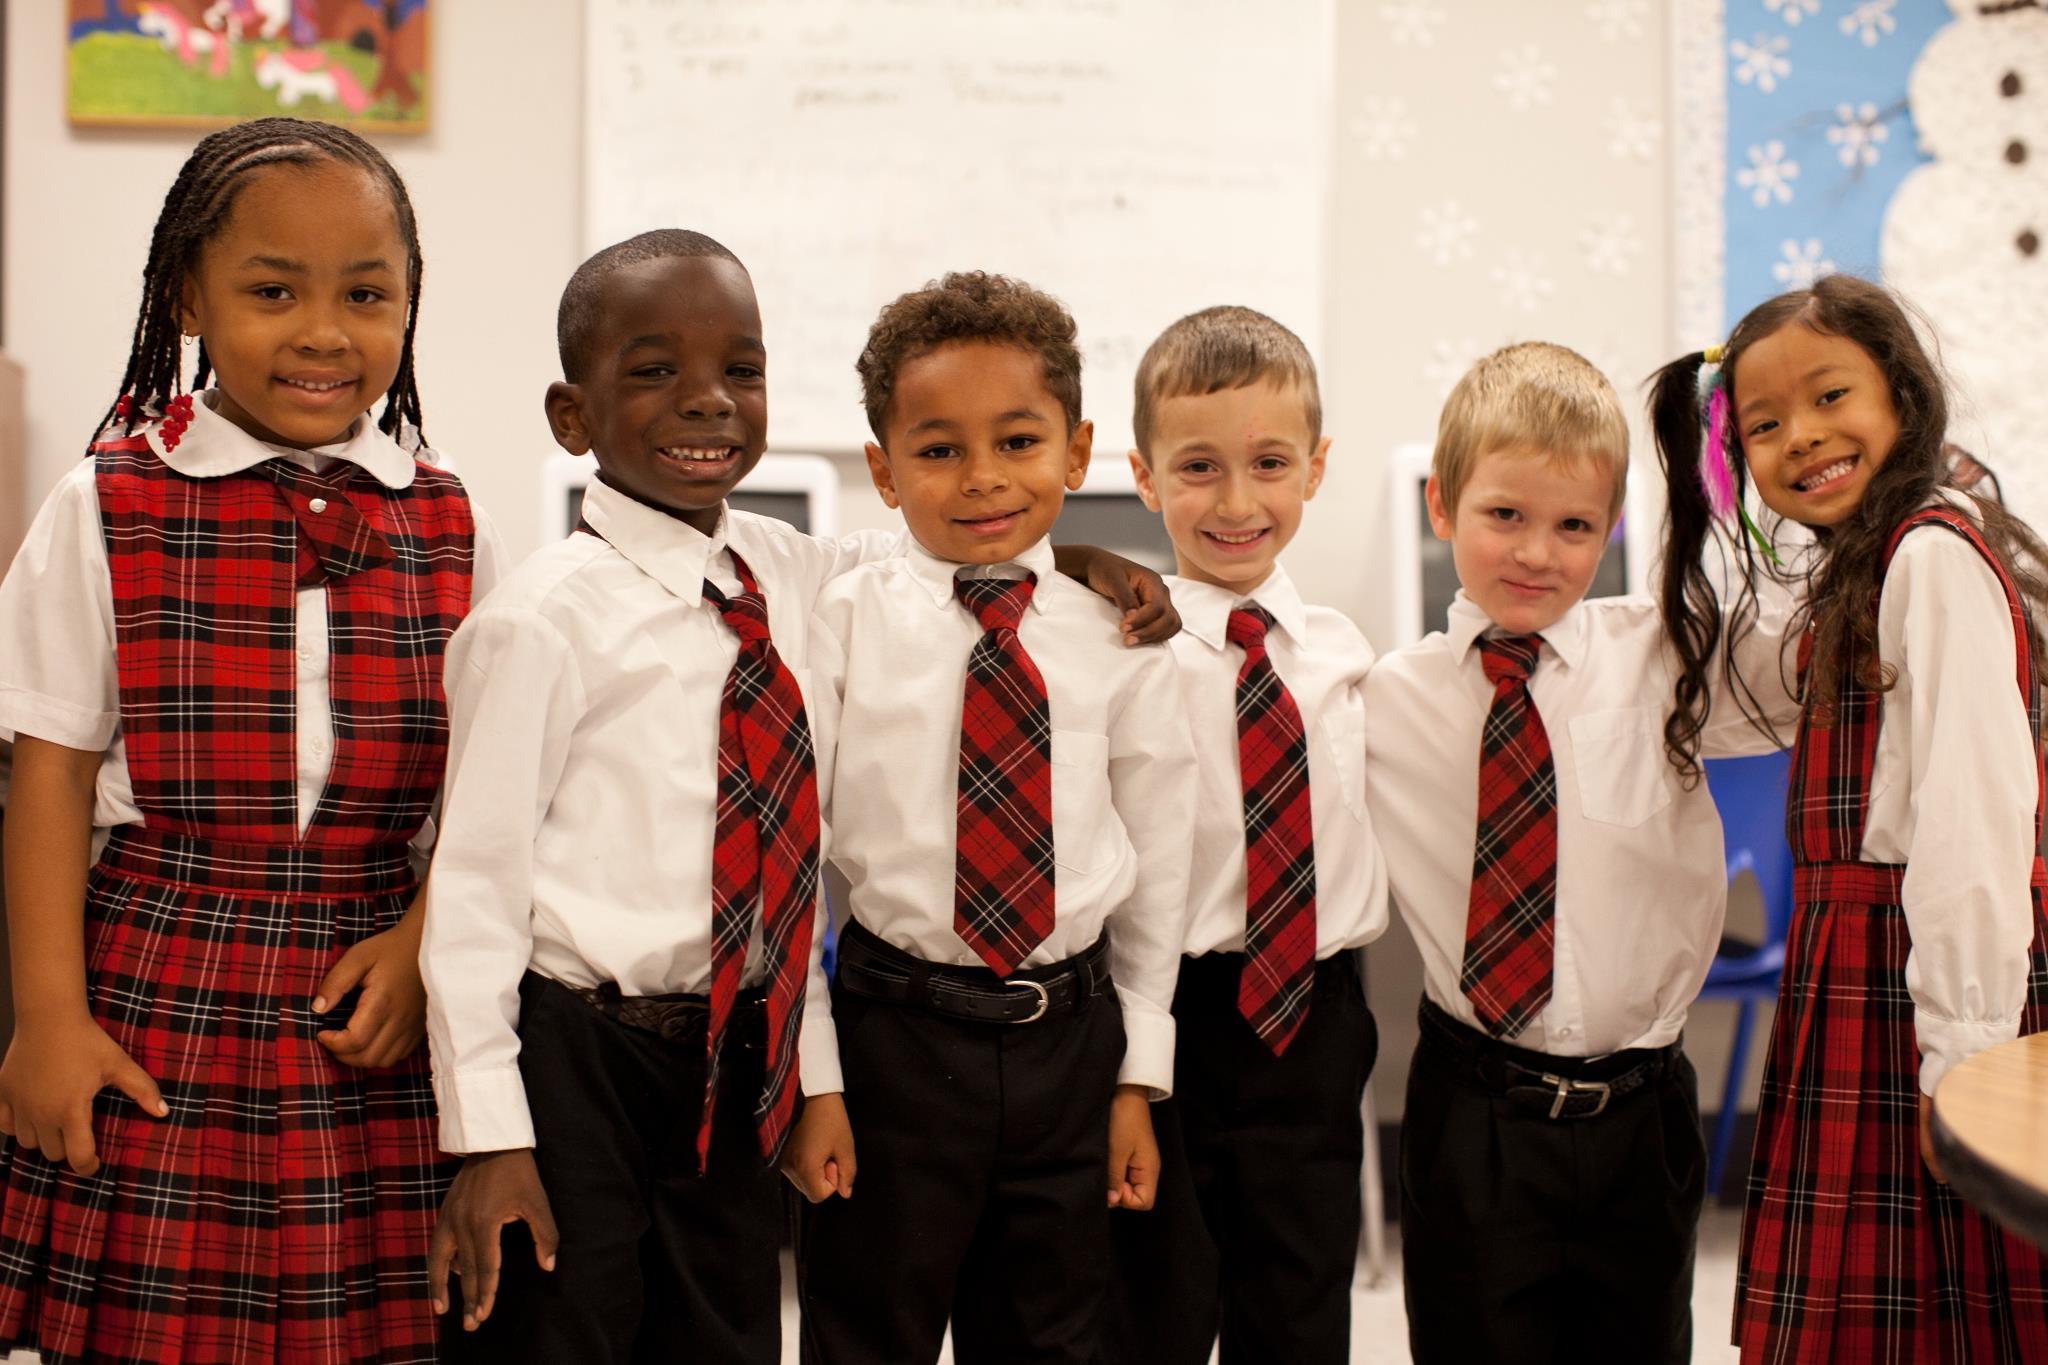 Photo courtesy of New Paradigm for Education.